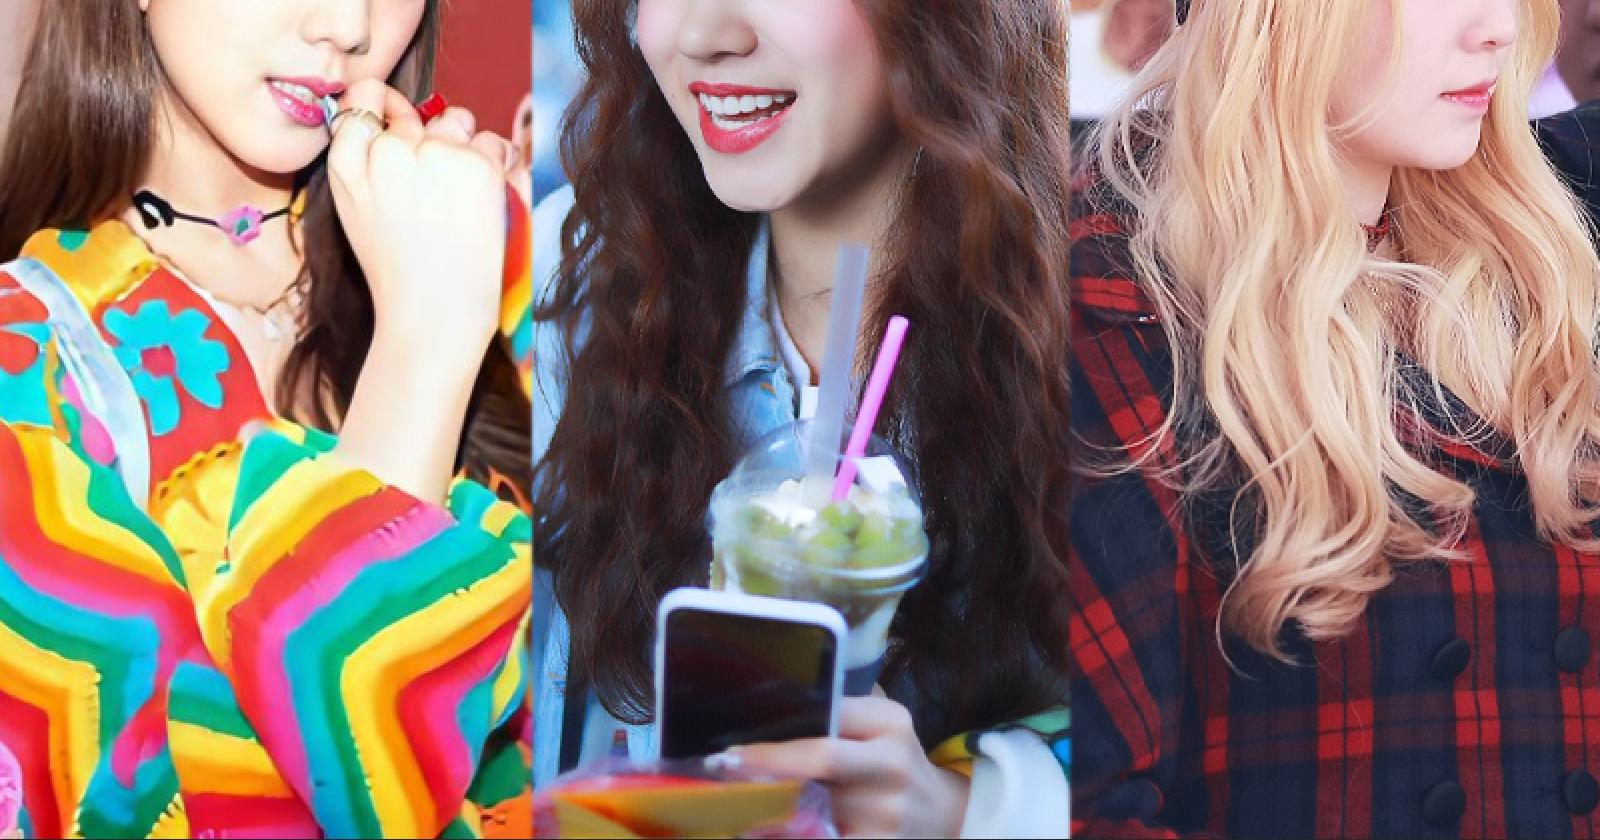 TOP 10 Female Idols Who Could be Ice Cream Brand Ambassador